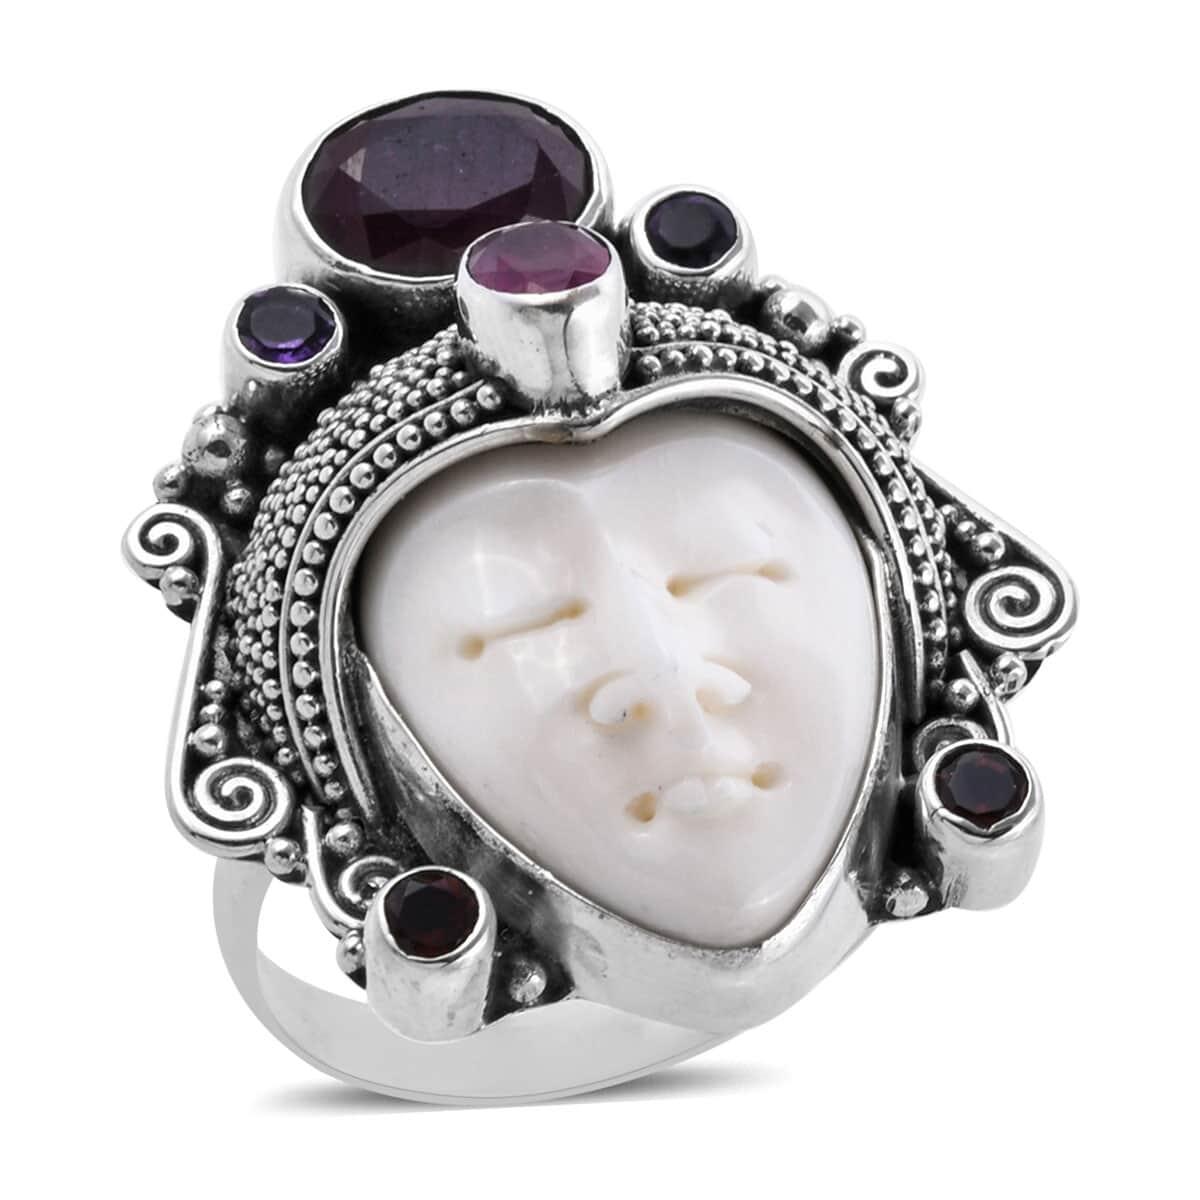 Bali Goddess Carved Bone, Multi Gemstone Ring in Sterling Silver (Size 8.0) (Avg. 11.97 g) 3.81 ctw